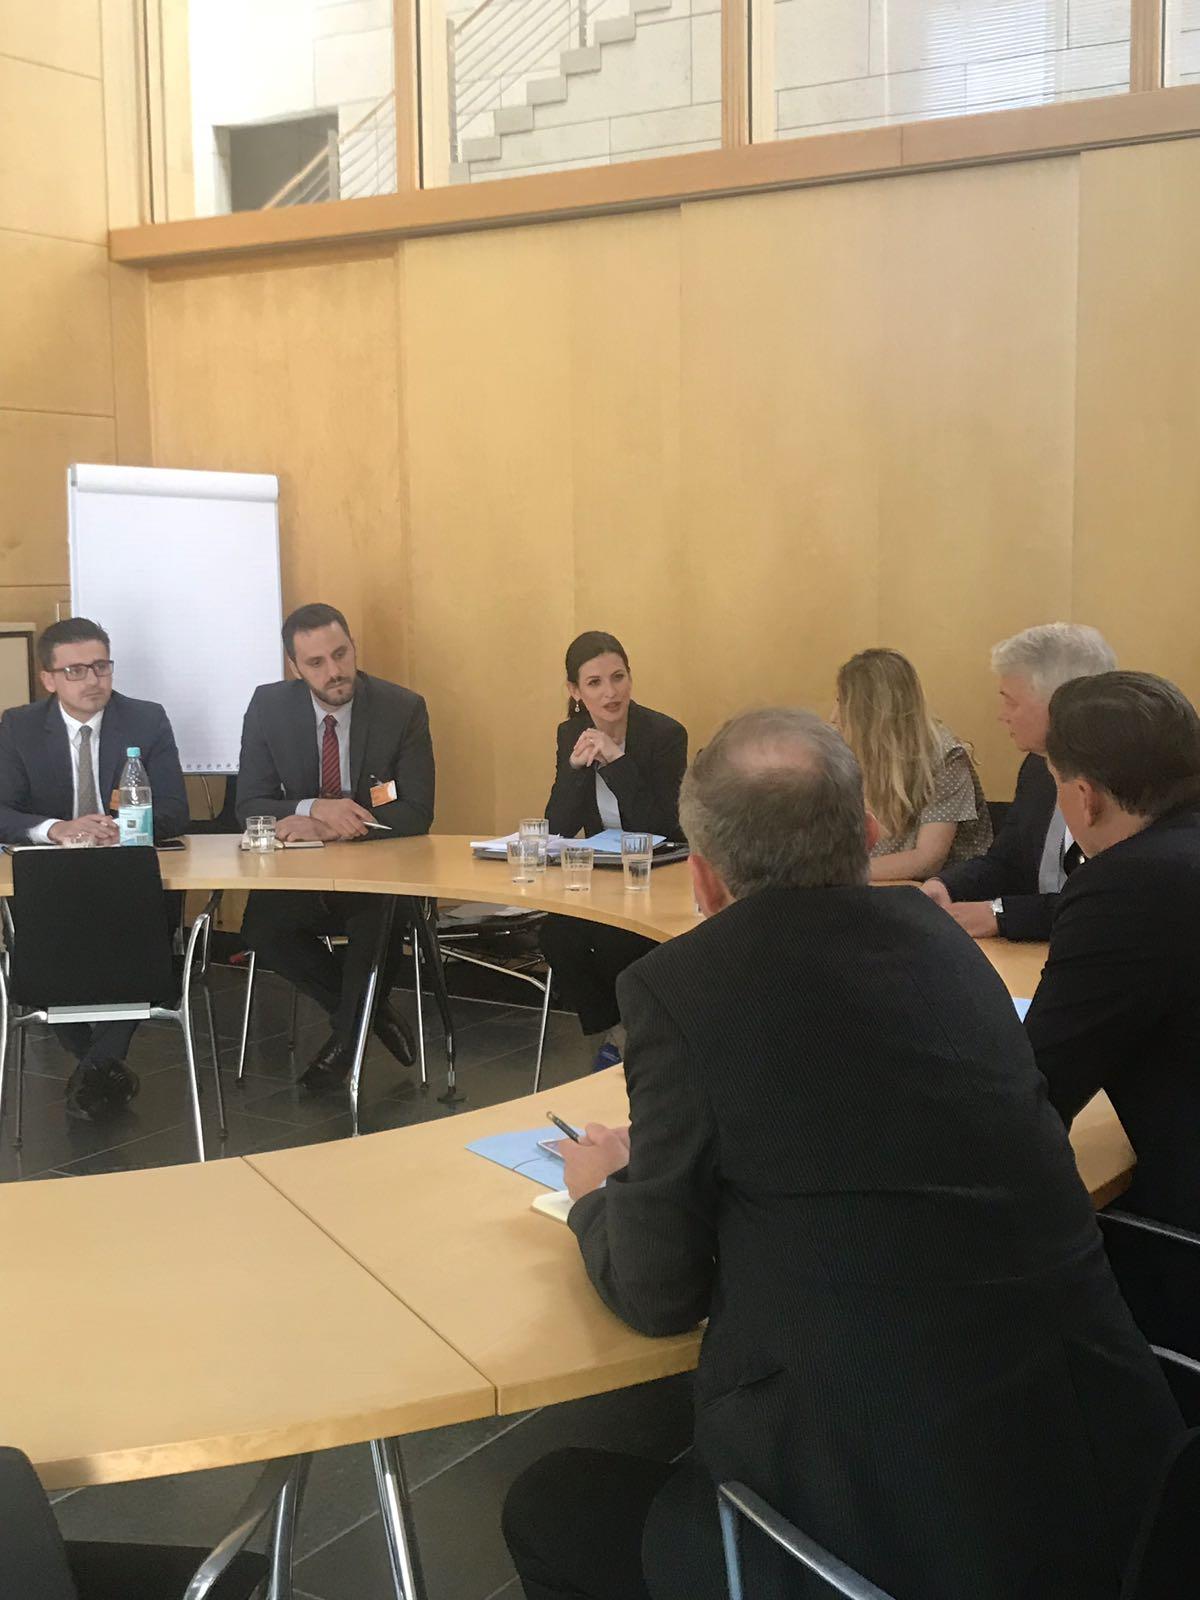 German authorities support the reforms undertaken by Albania